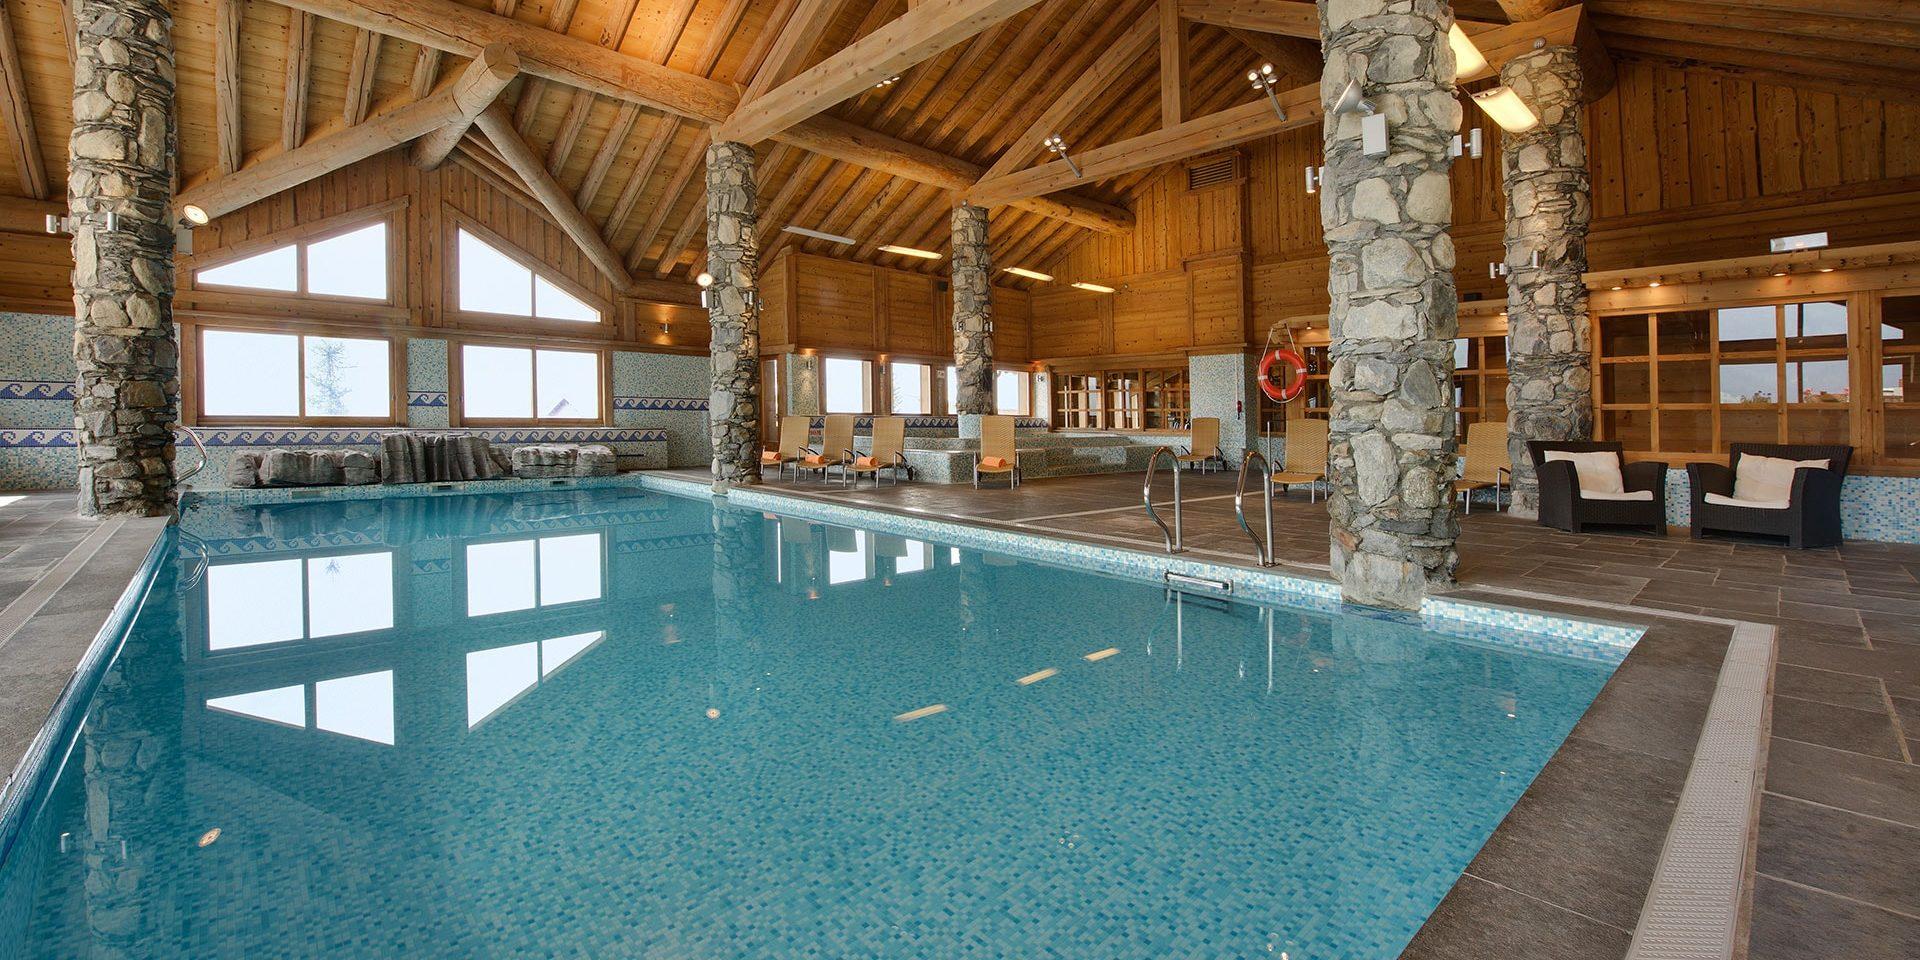 CGH Oree des Cimes Vallandry Paradiski Frankrijk wintersport skivakantie luxe zwembad zwemmen ontspannen jacuzzi bubbelbad ligstoelen wellness relaxen na skiën